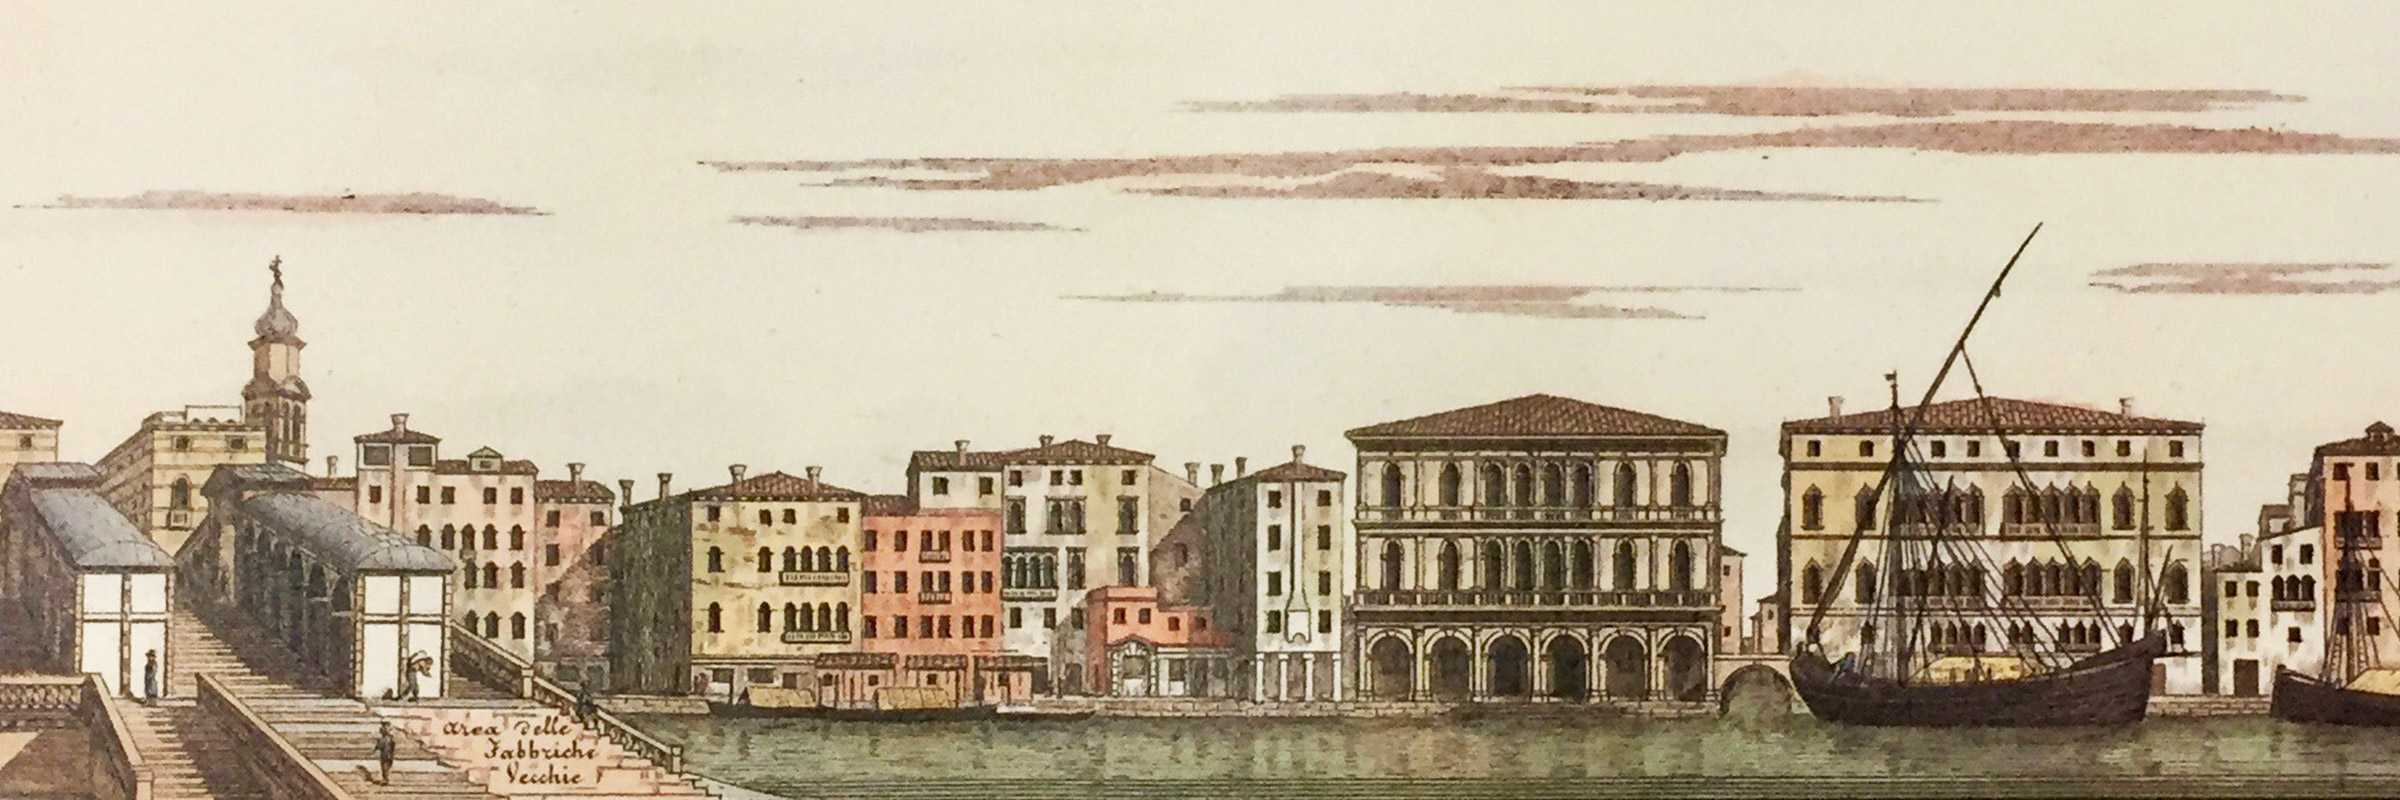 "Riva del Vin - watercolor facsimile reproduction of the precious nineteenth-century edition ""Grand Canal and St. Mark's Square, described by Antonio Quadri, taken over and engraved by Dionisio Moretti"" - (Supernova, Canal Grande e Piazza San Marco, courtesy)."